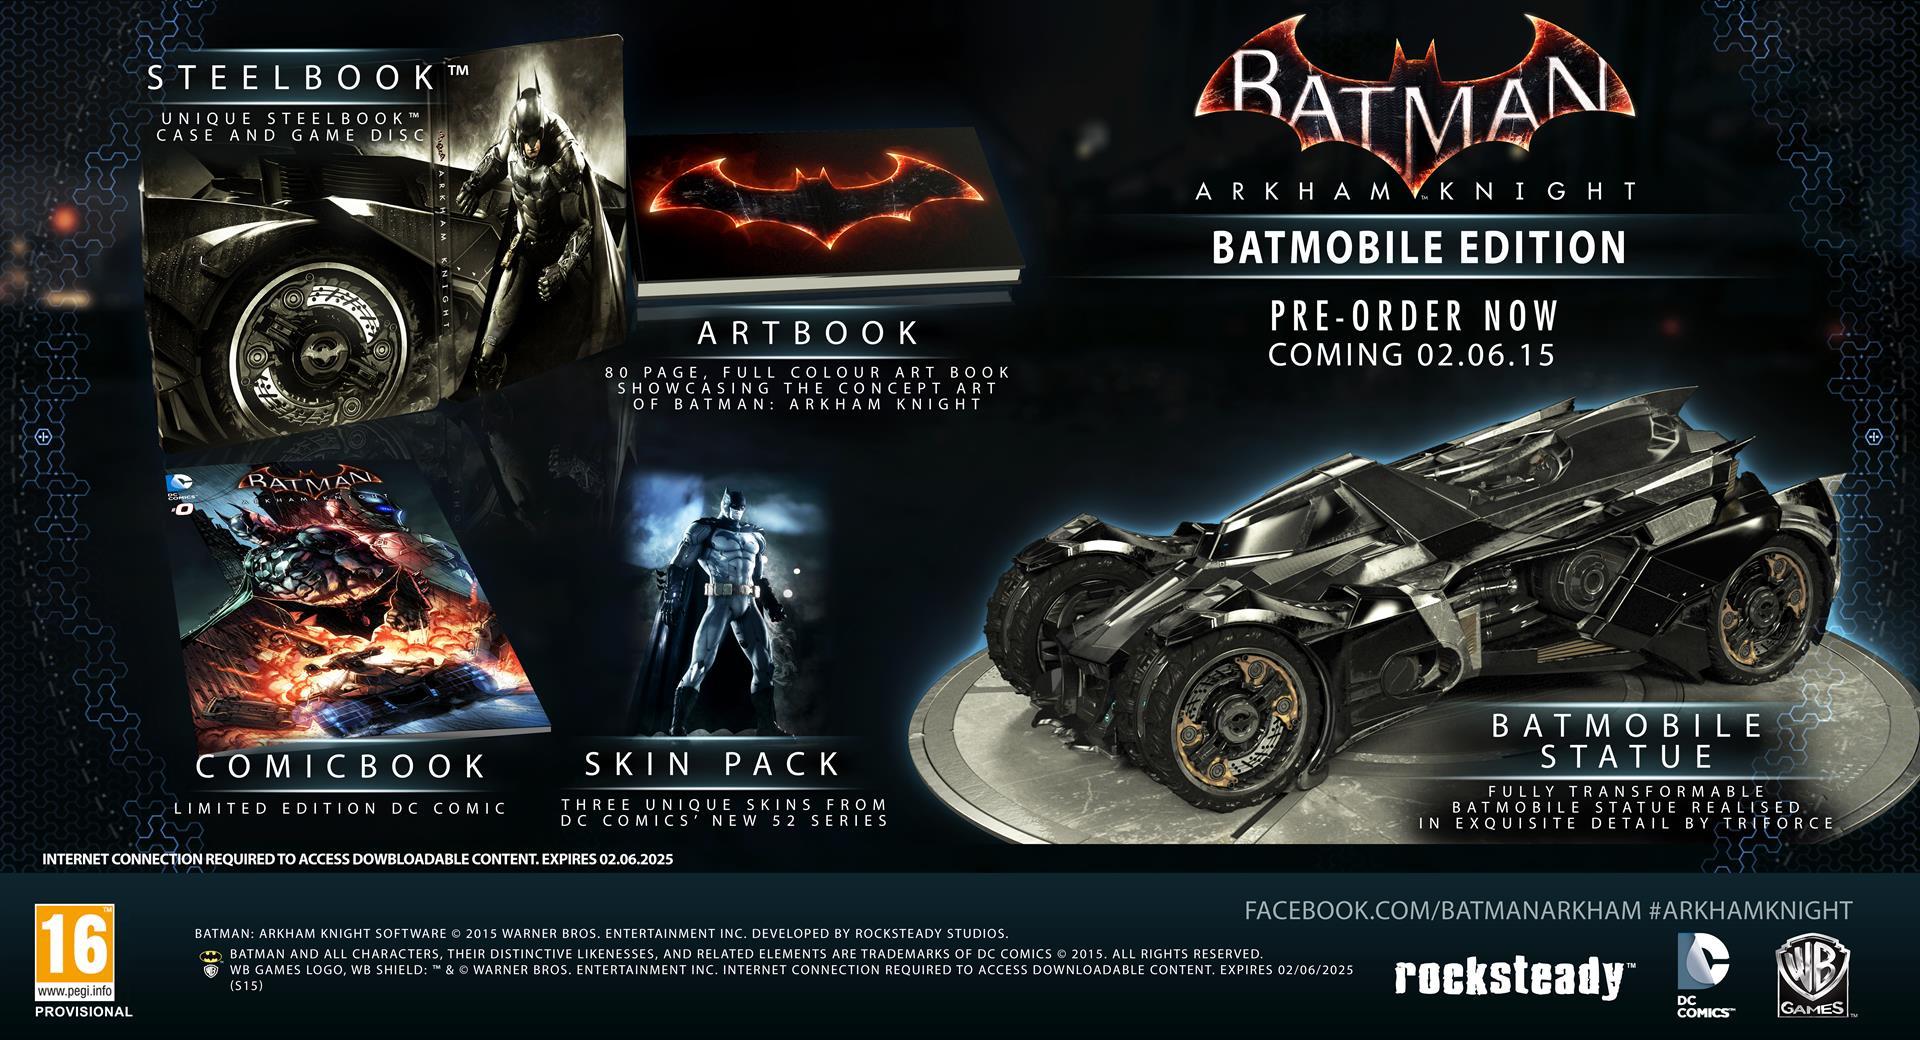 arkham knight batmobile ediition